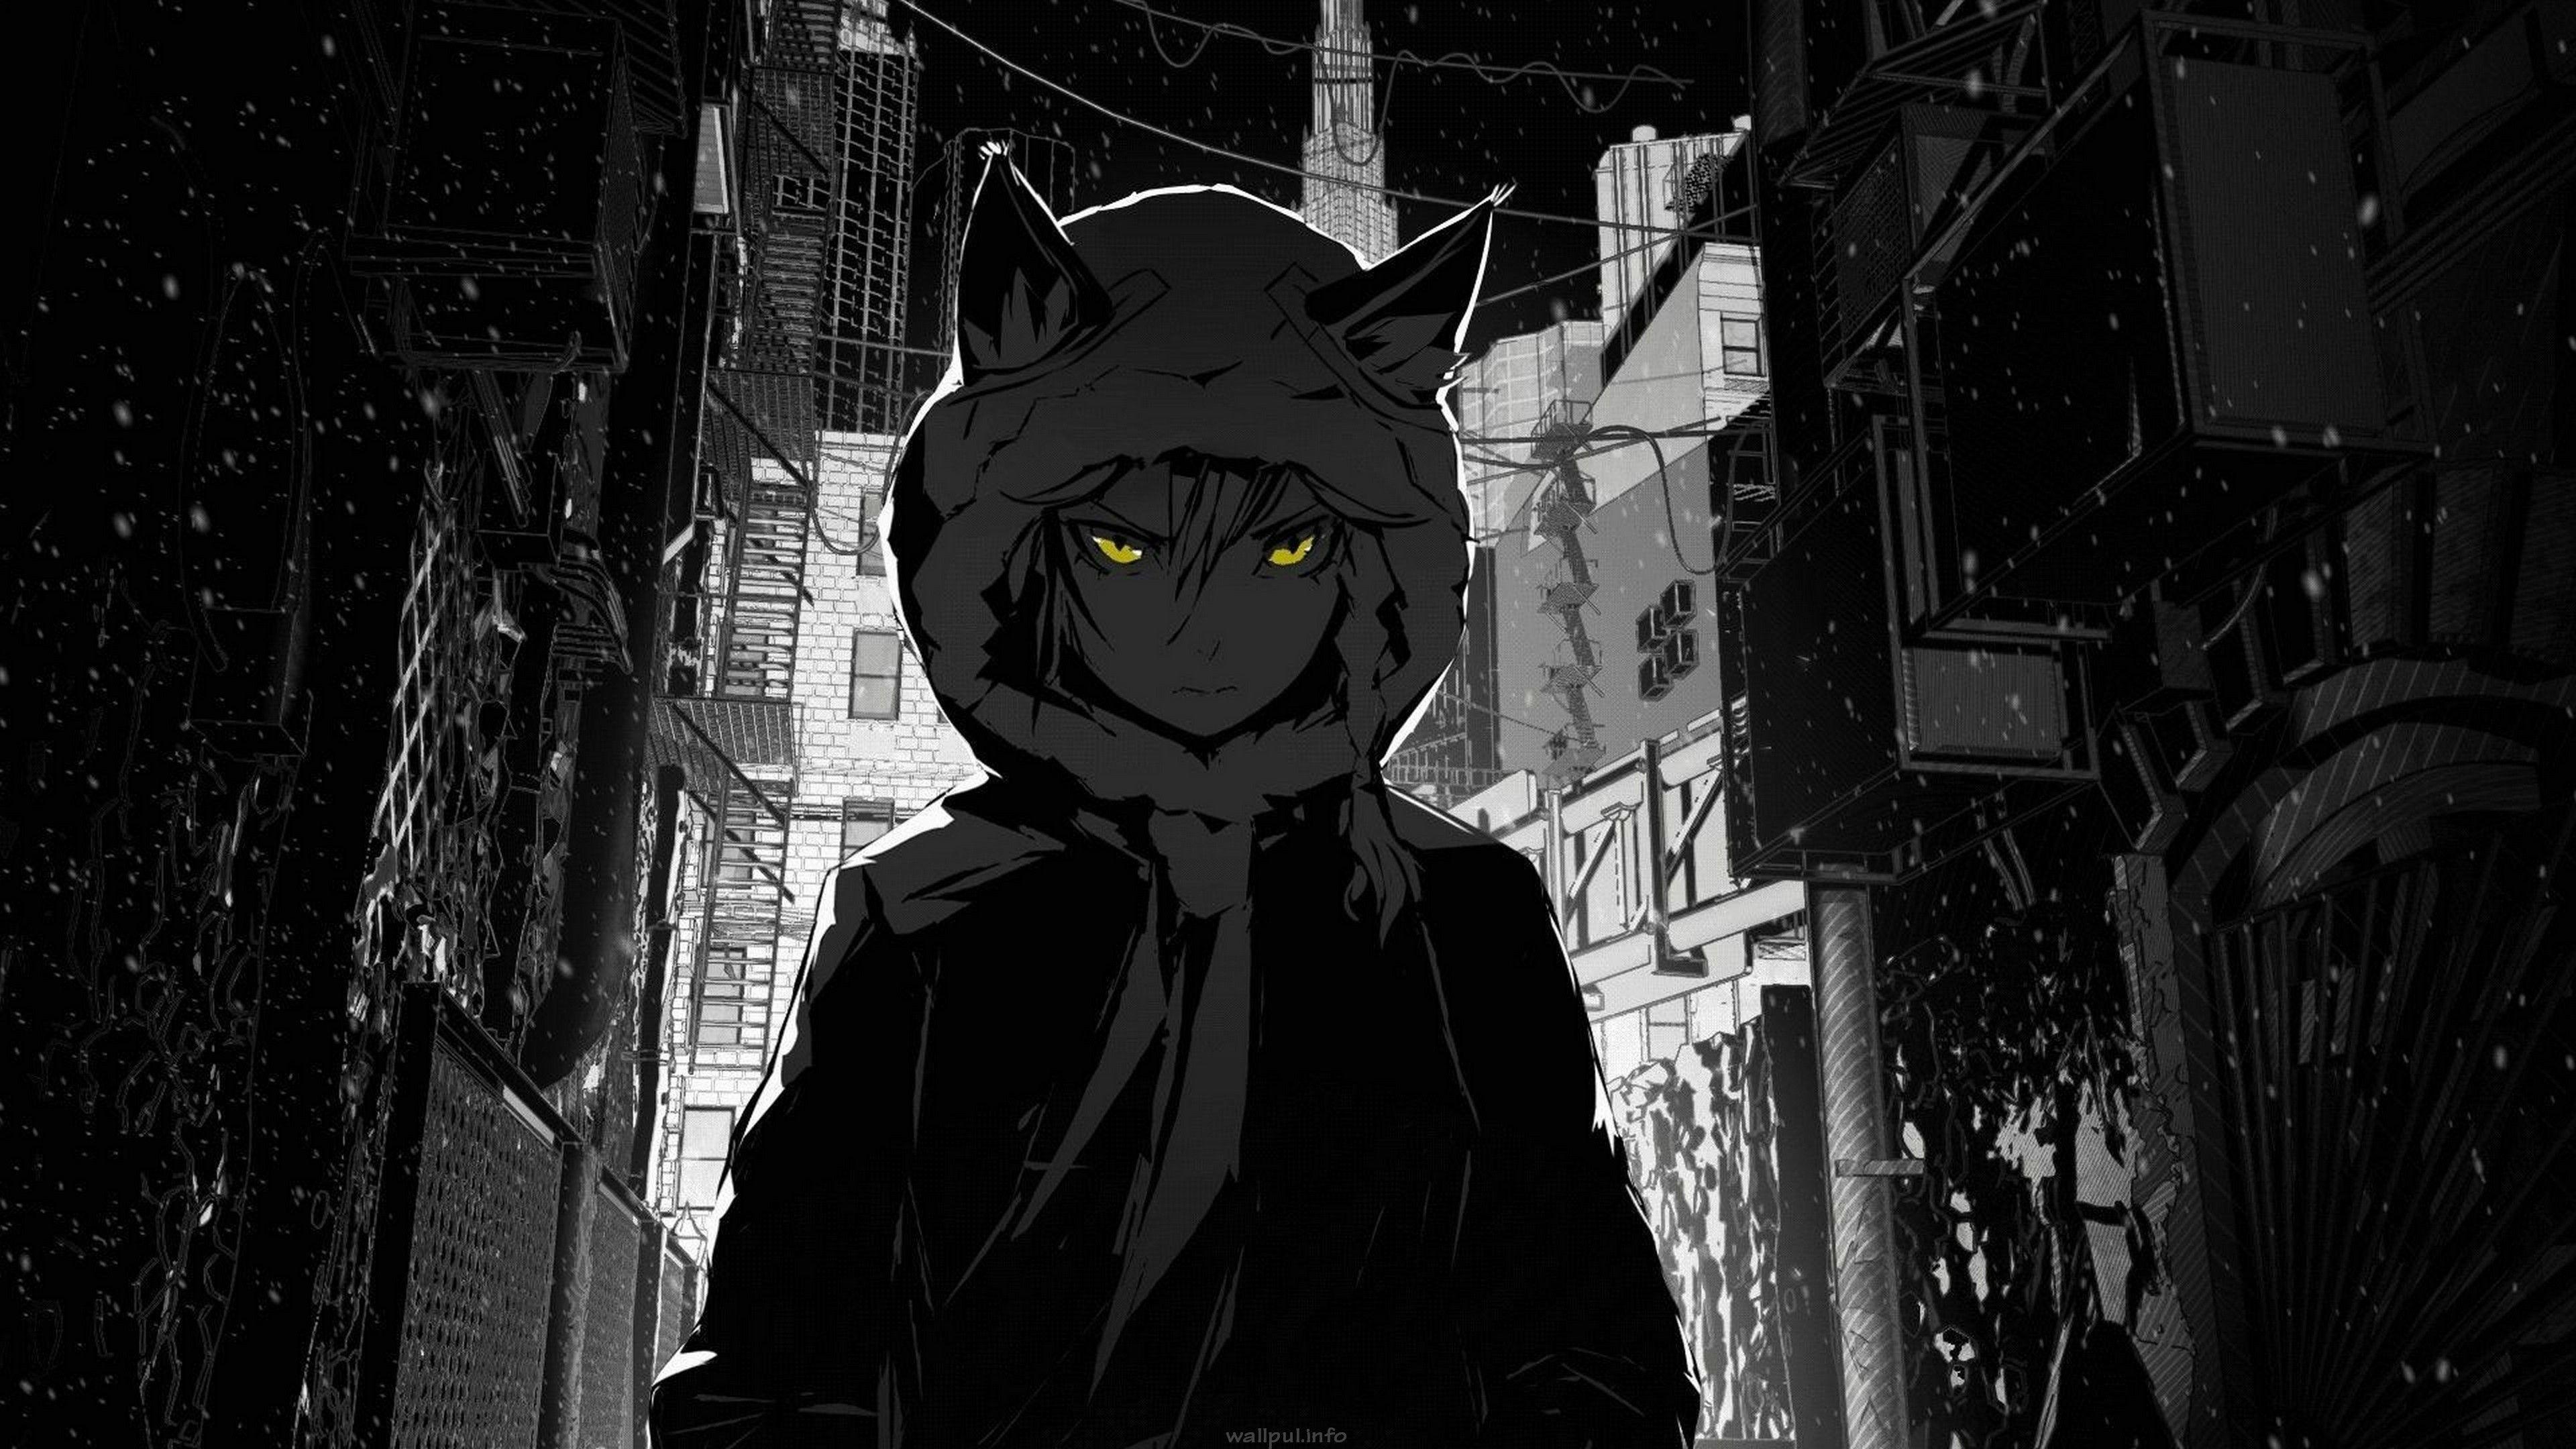 Home > comics > naruto art anime wallpaper mod apk > naruto art anime wallpaper apk. Anime 4K Wallpapers - Top Free Anime 4K Backgrounds ...